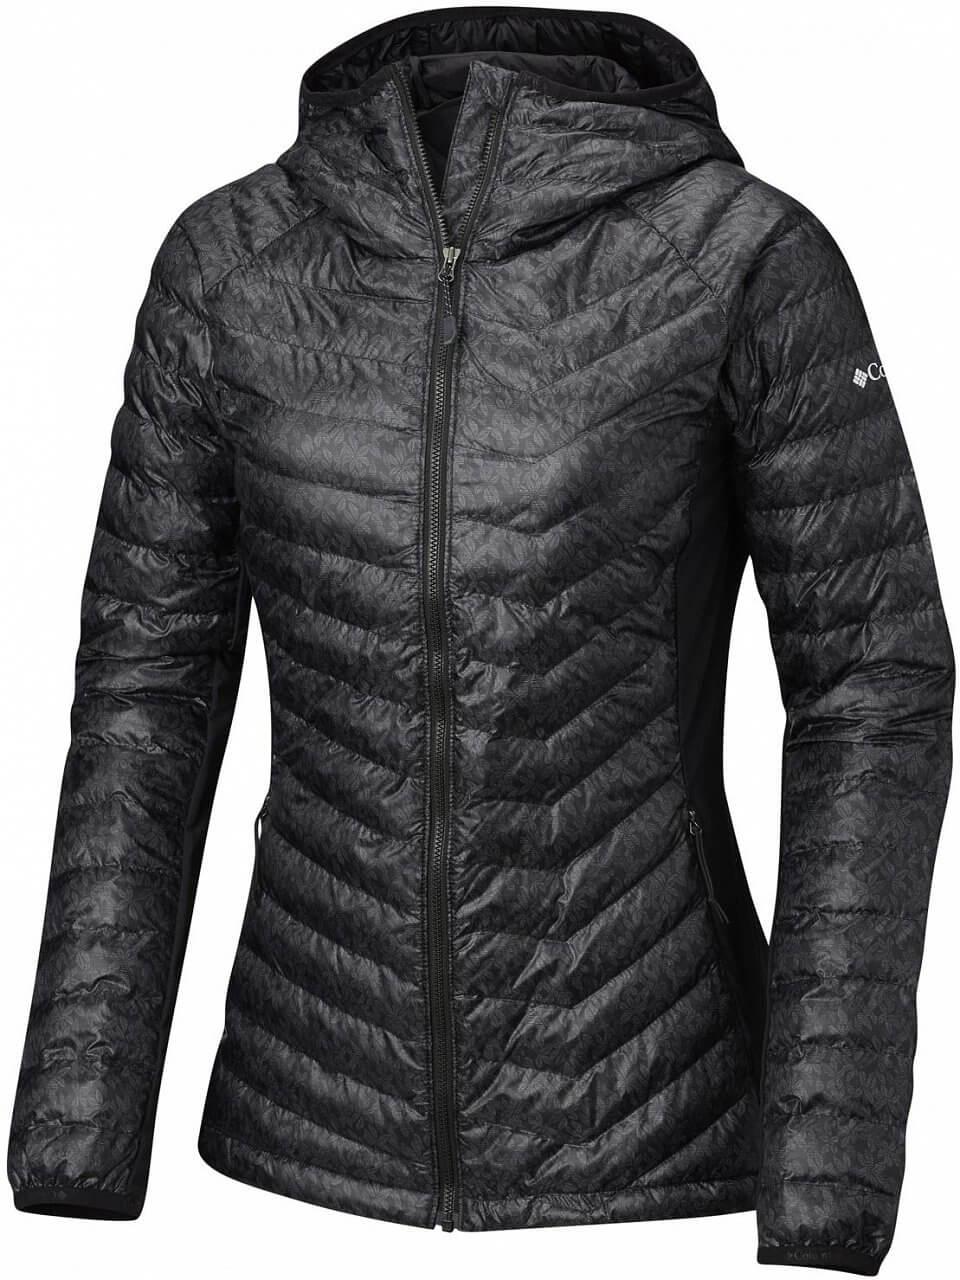 Dámská bunda Columbia Powder Lite Light Hooded Jacket